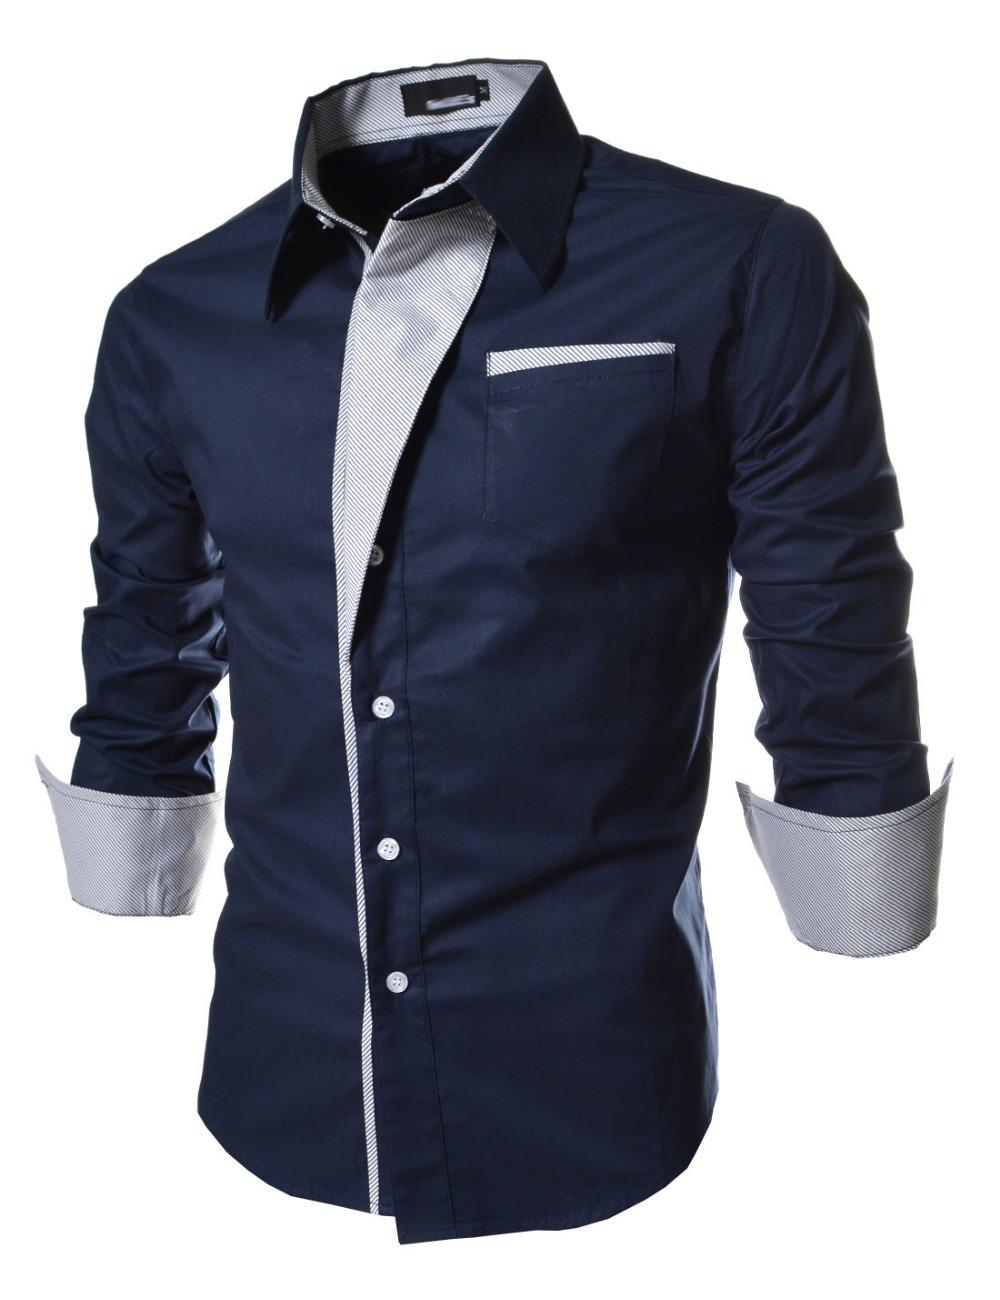 2015 new fashion Casual Men Shirts Long Sleeve Autumn great Brand Cotton Slim High Quality shirt